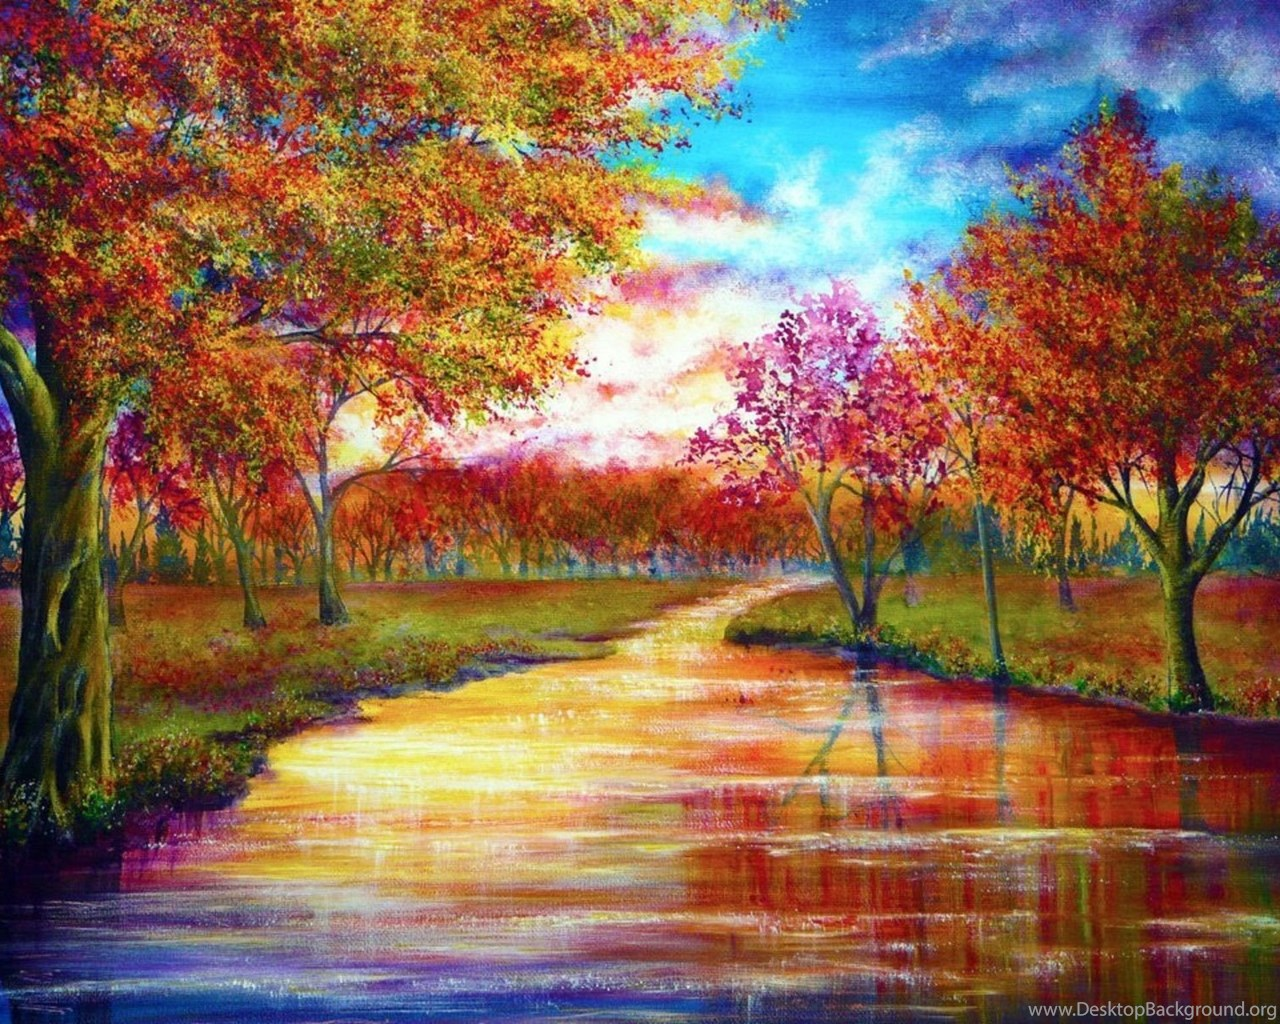 Trees september rivers vibrant colors wallpapers desktop - Vibrant background ...